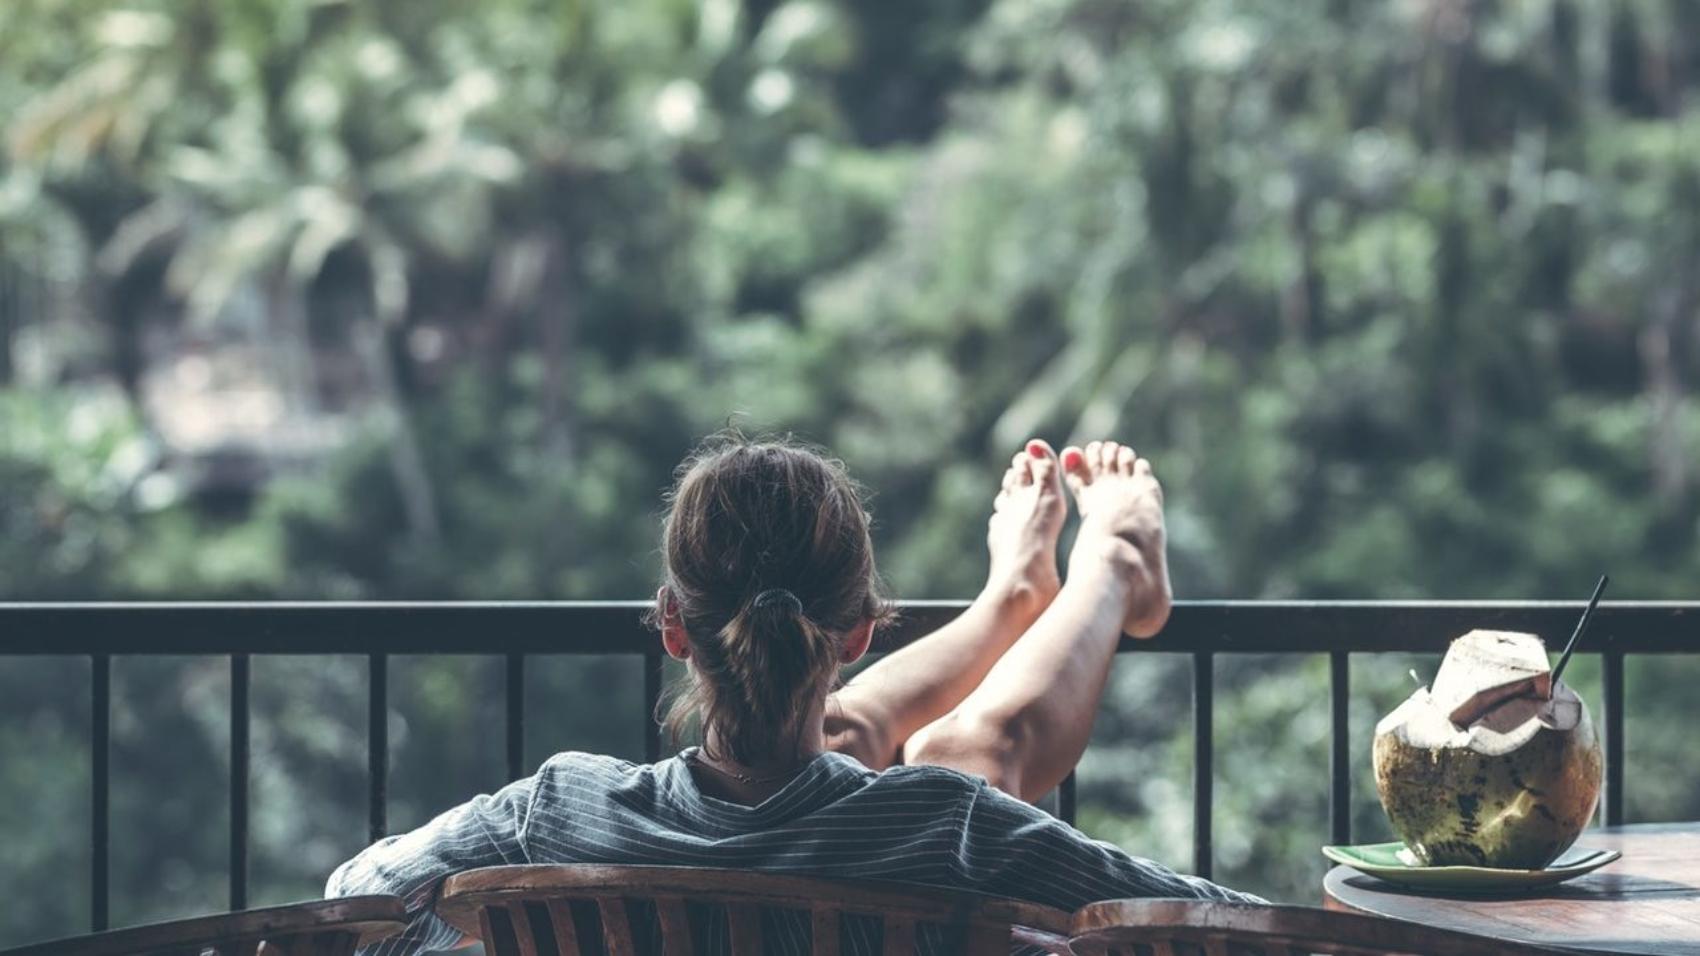 cropped-adult-balcony-beverage-1230665.jpg